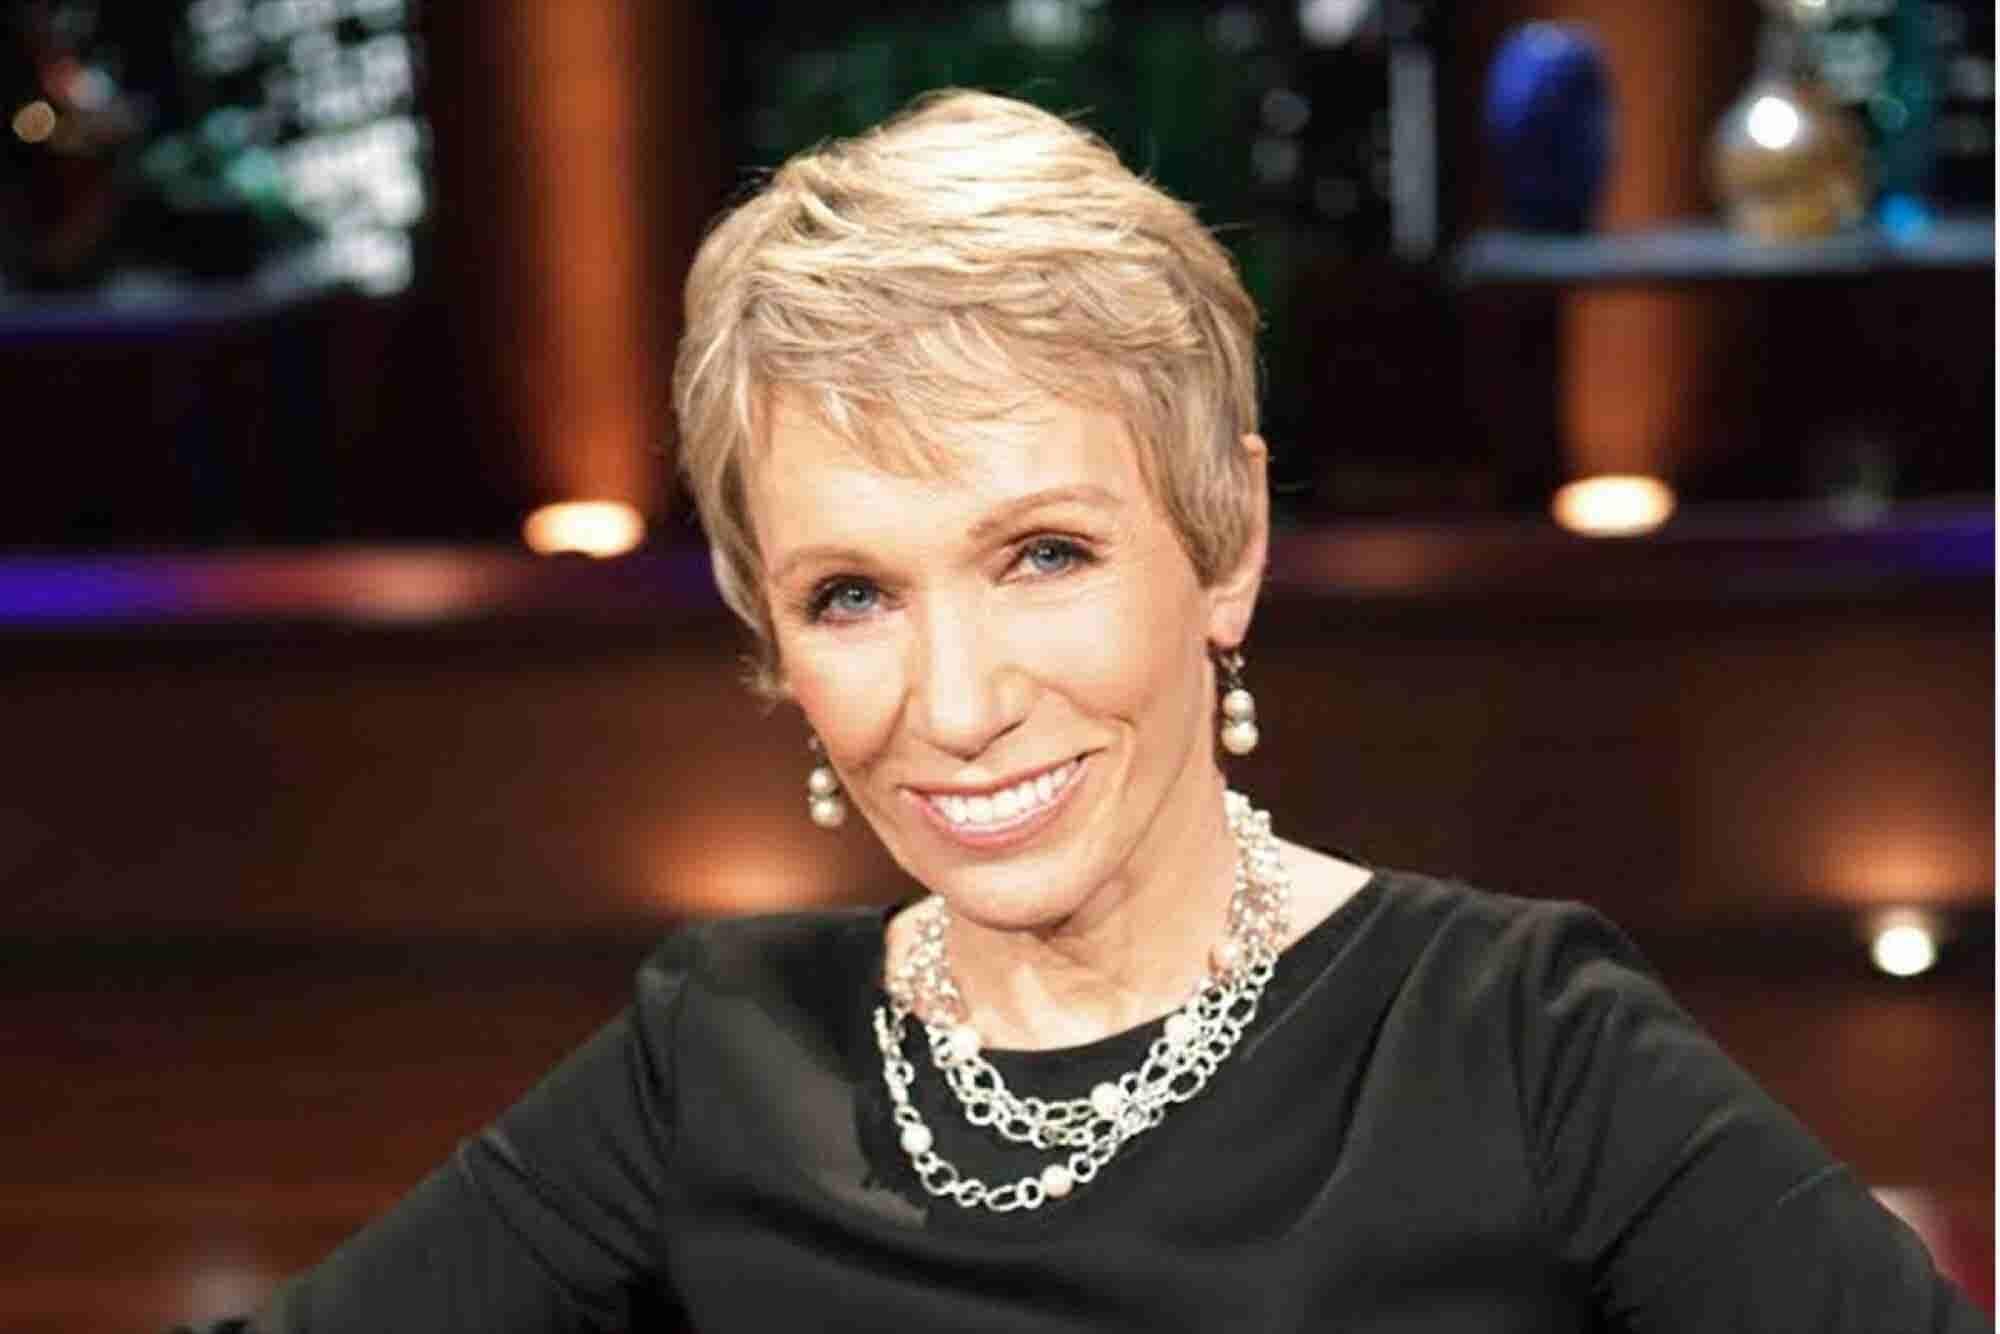 'Shark Tank' Recap: Barbara Corcoran Gets Baffled by a 'Wild-Ass Entrepreneur'